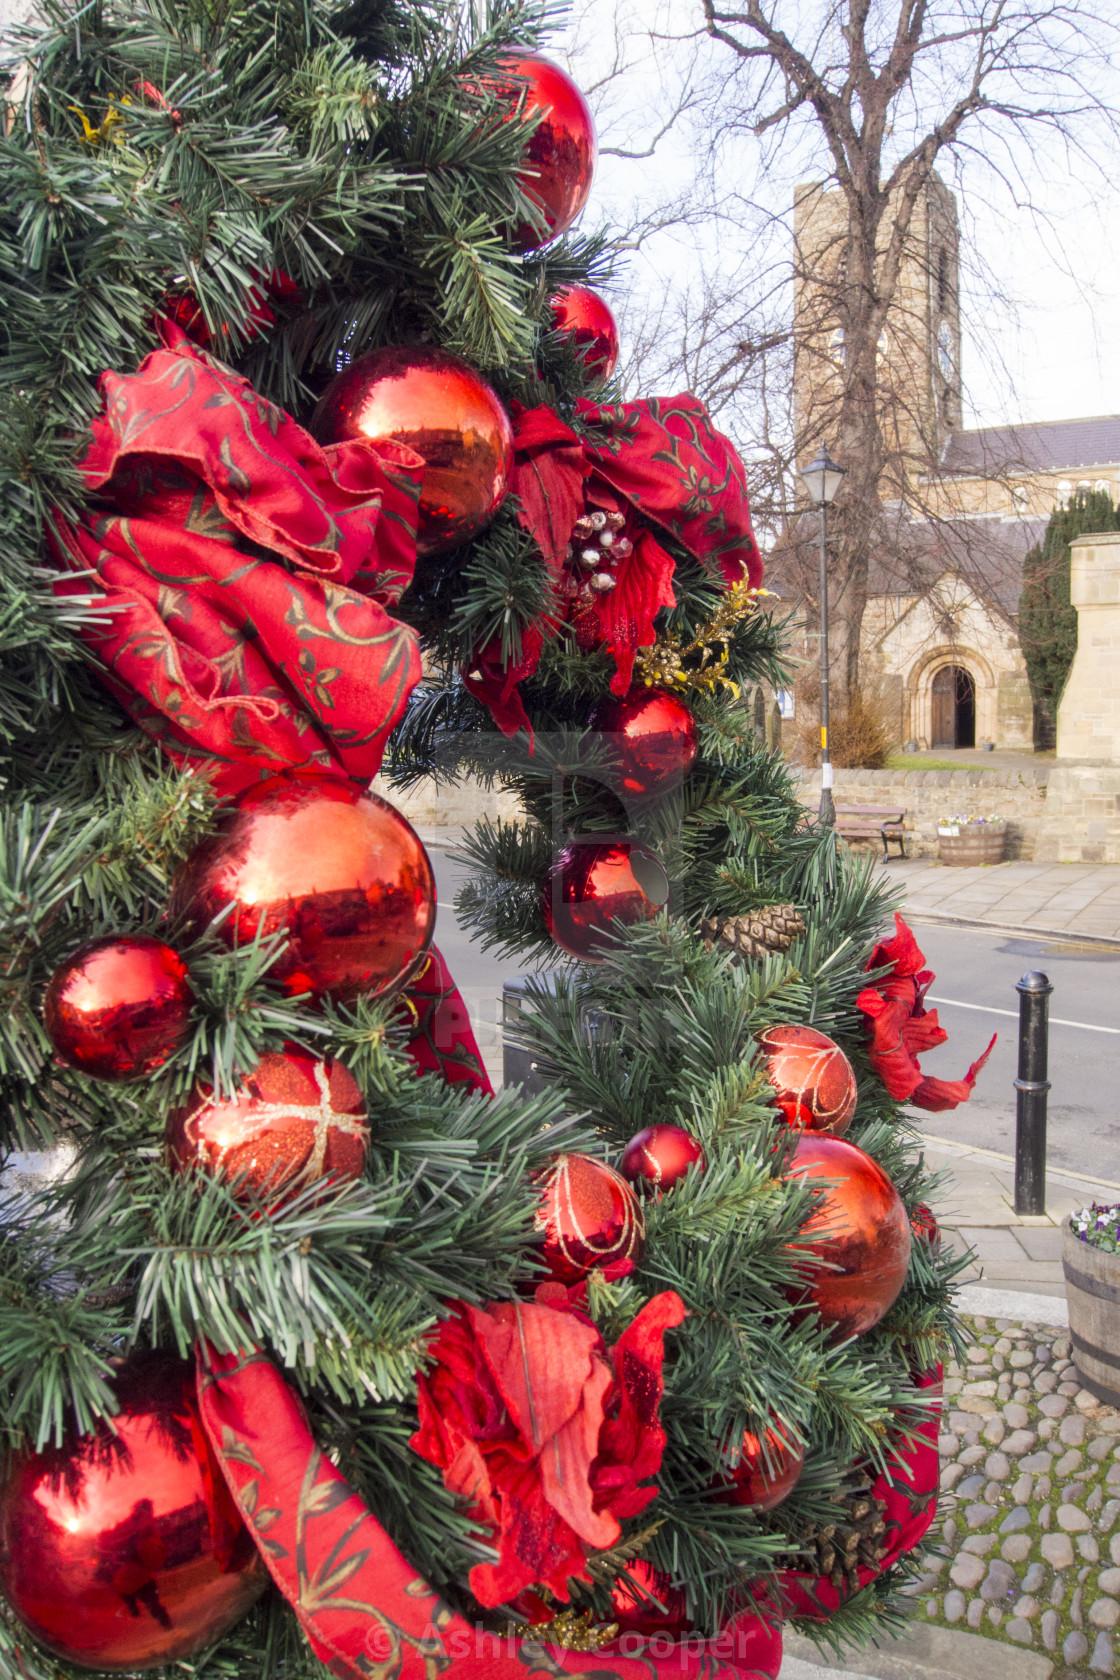 Christmas Decorations Oposite Corbridge Church